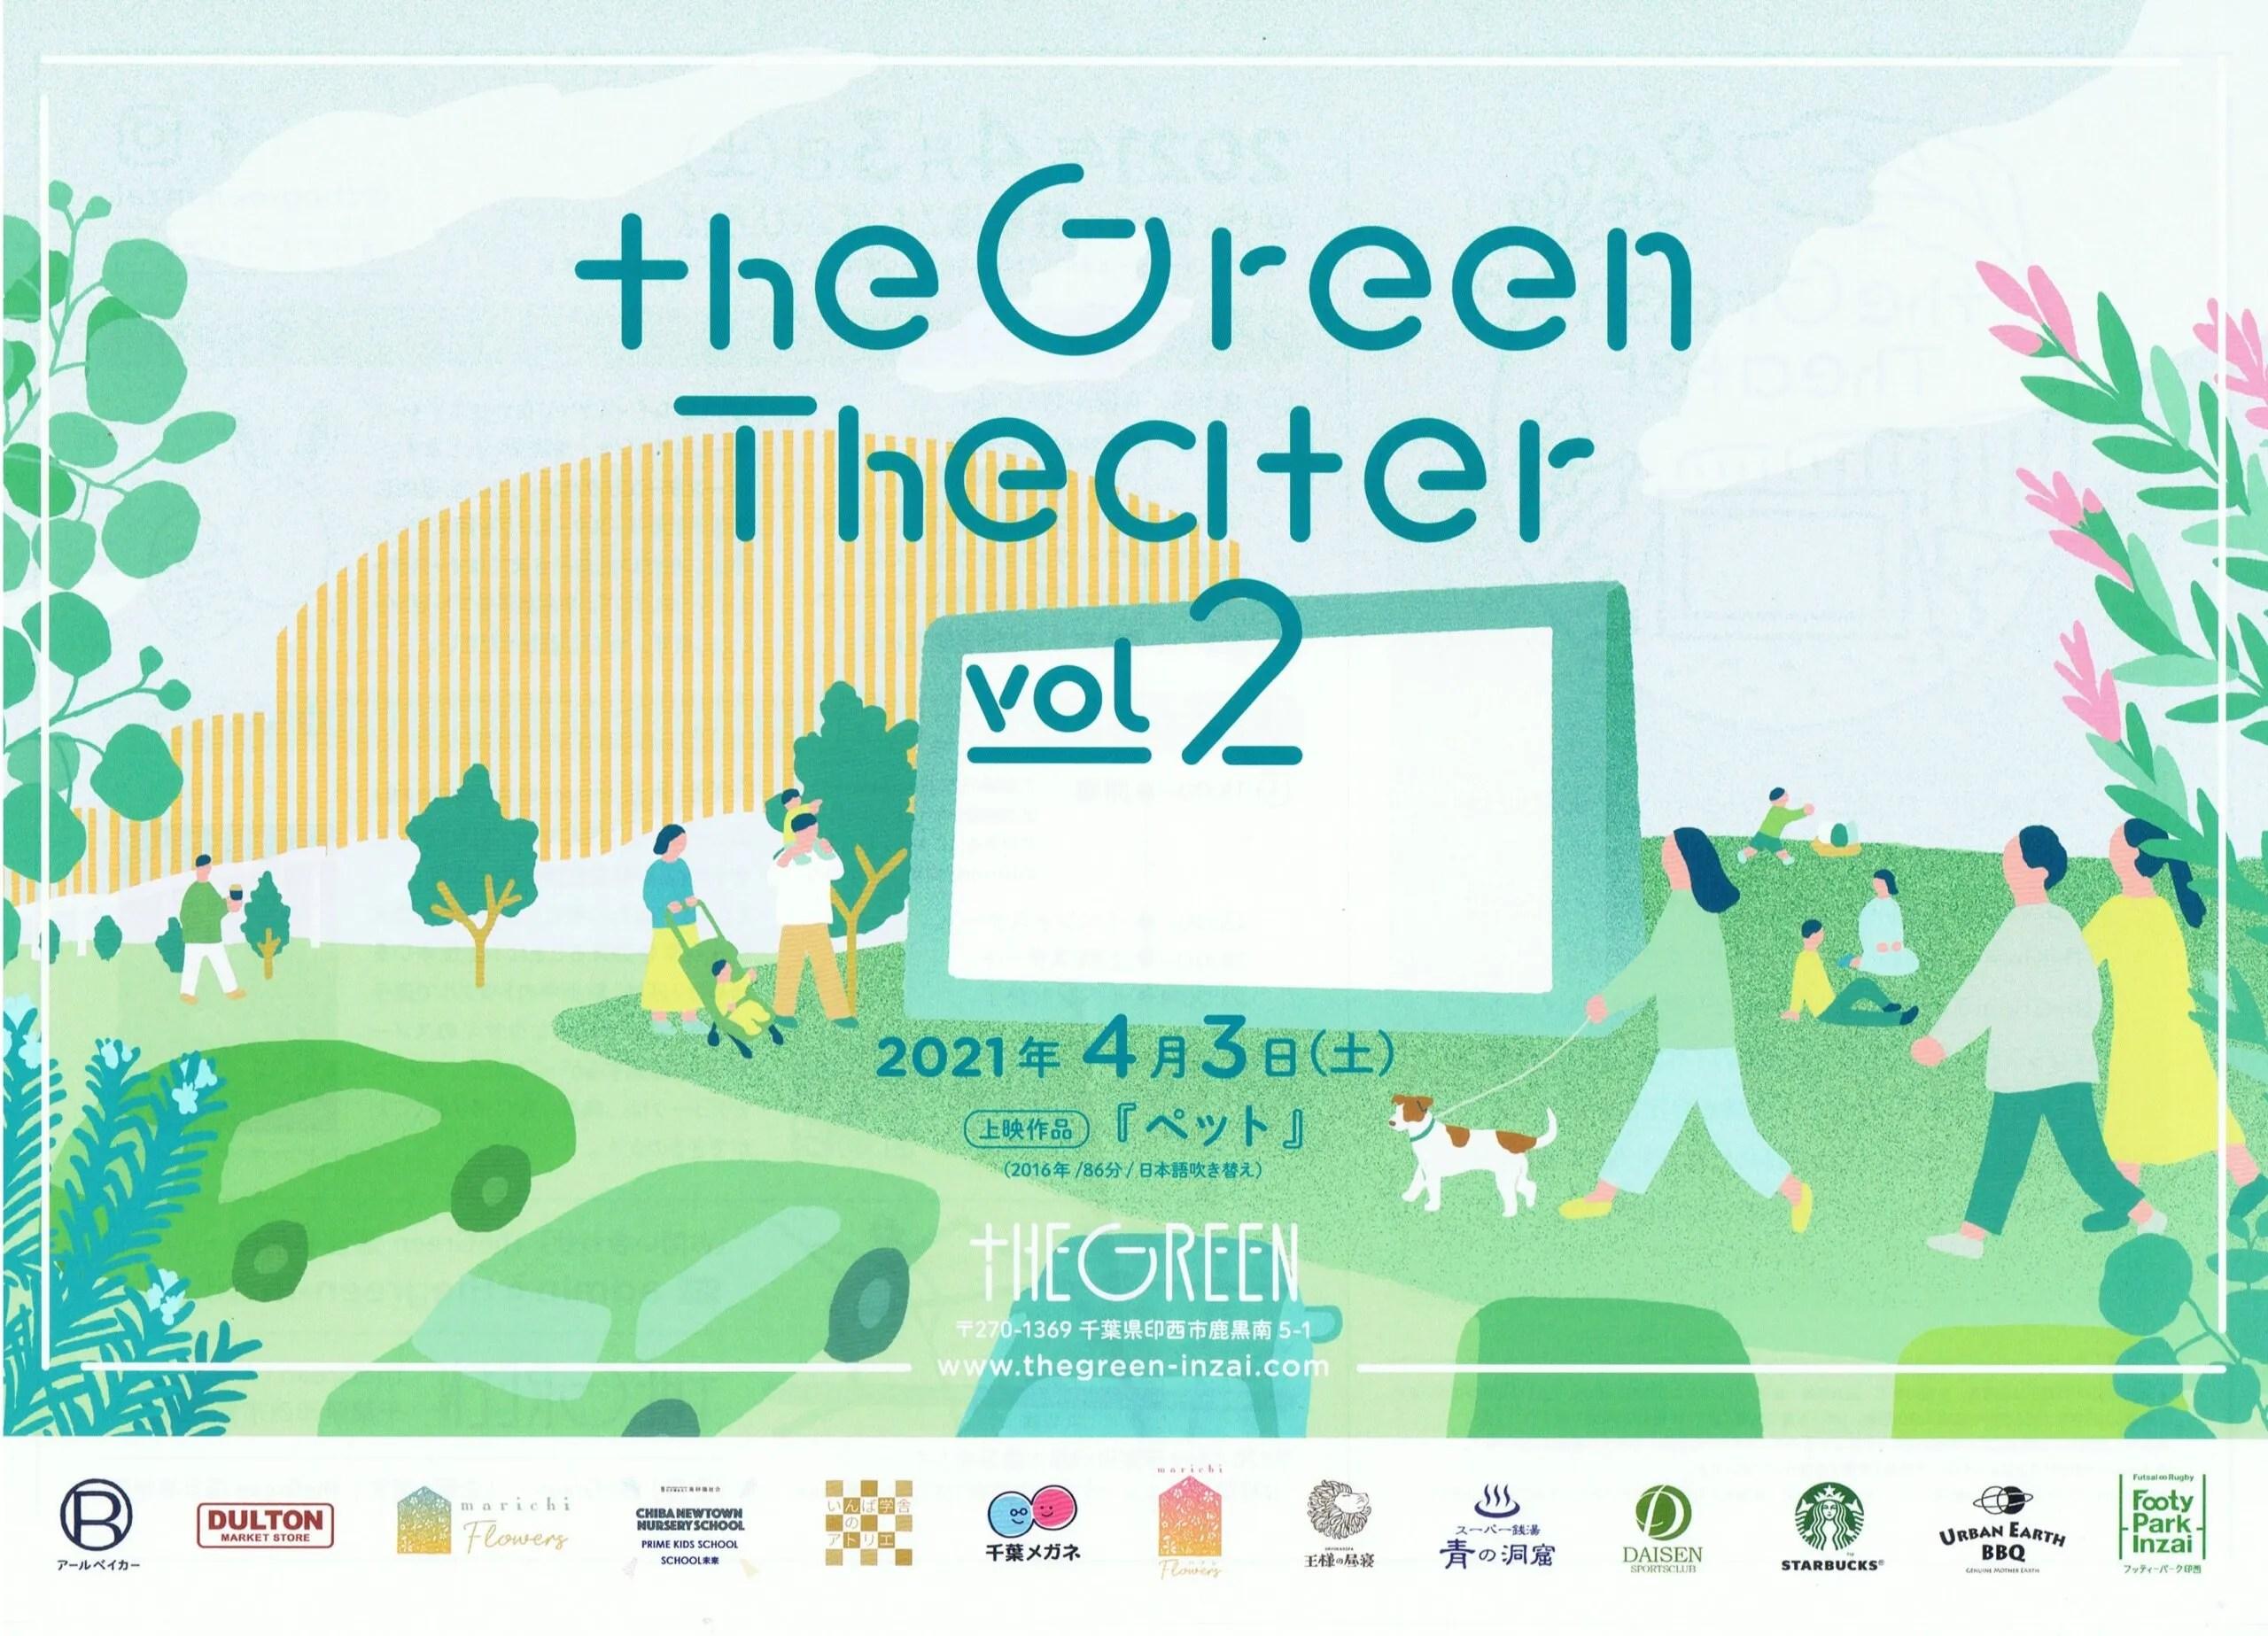 「theGreen theater vol.02」が開催です~!01